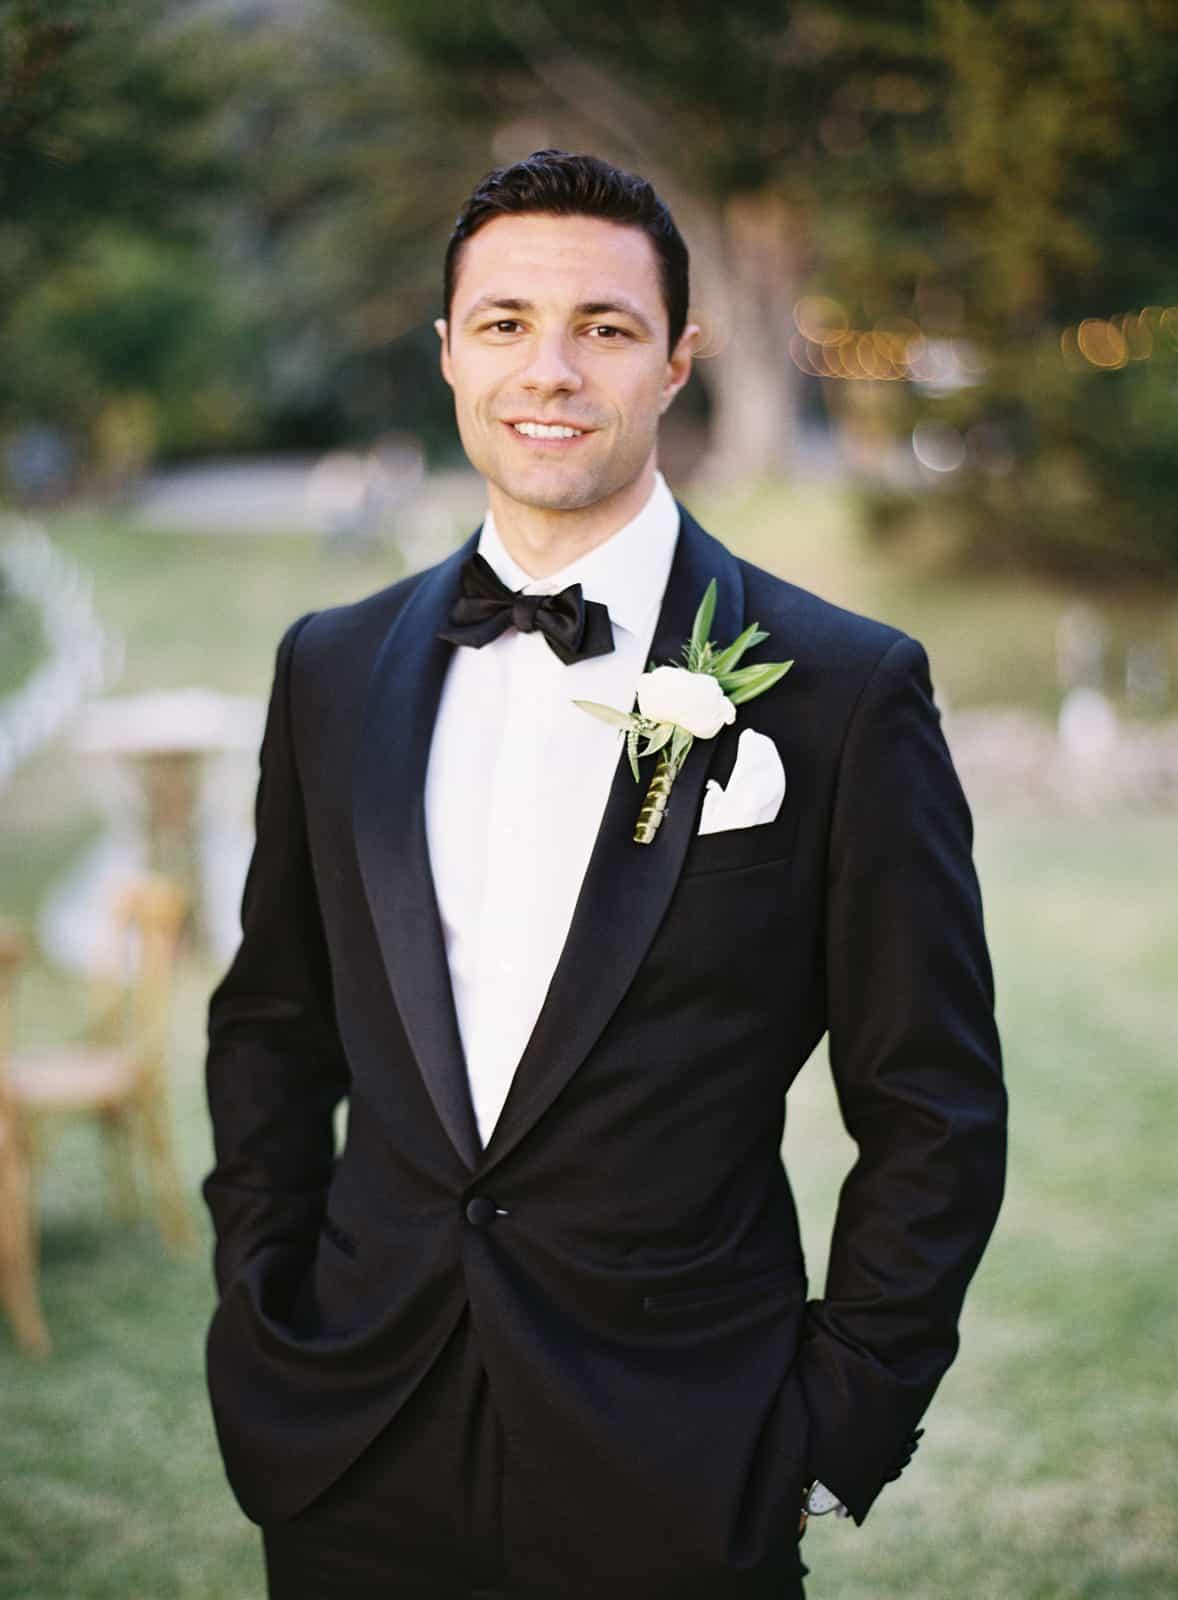 groom portrait in black tux